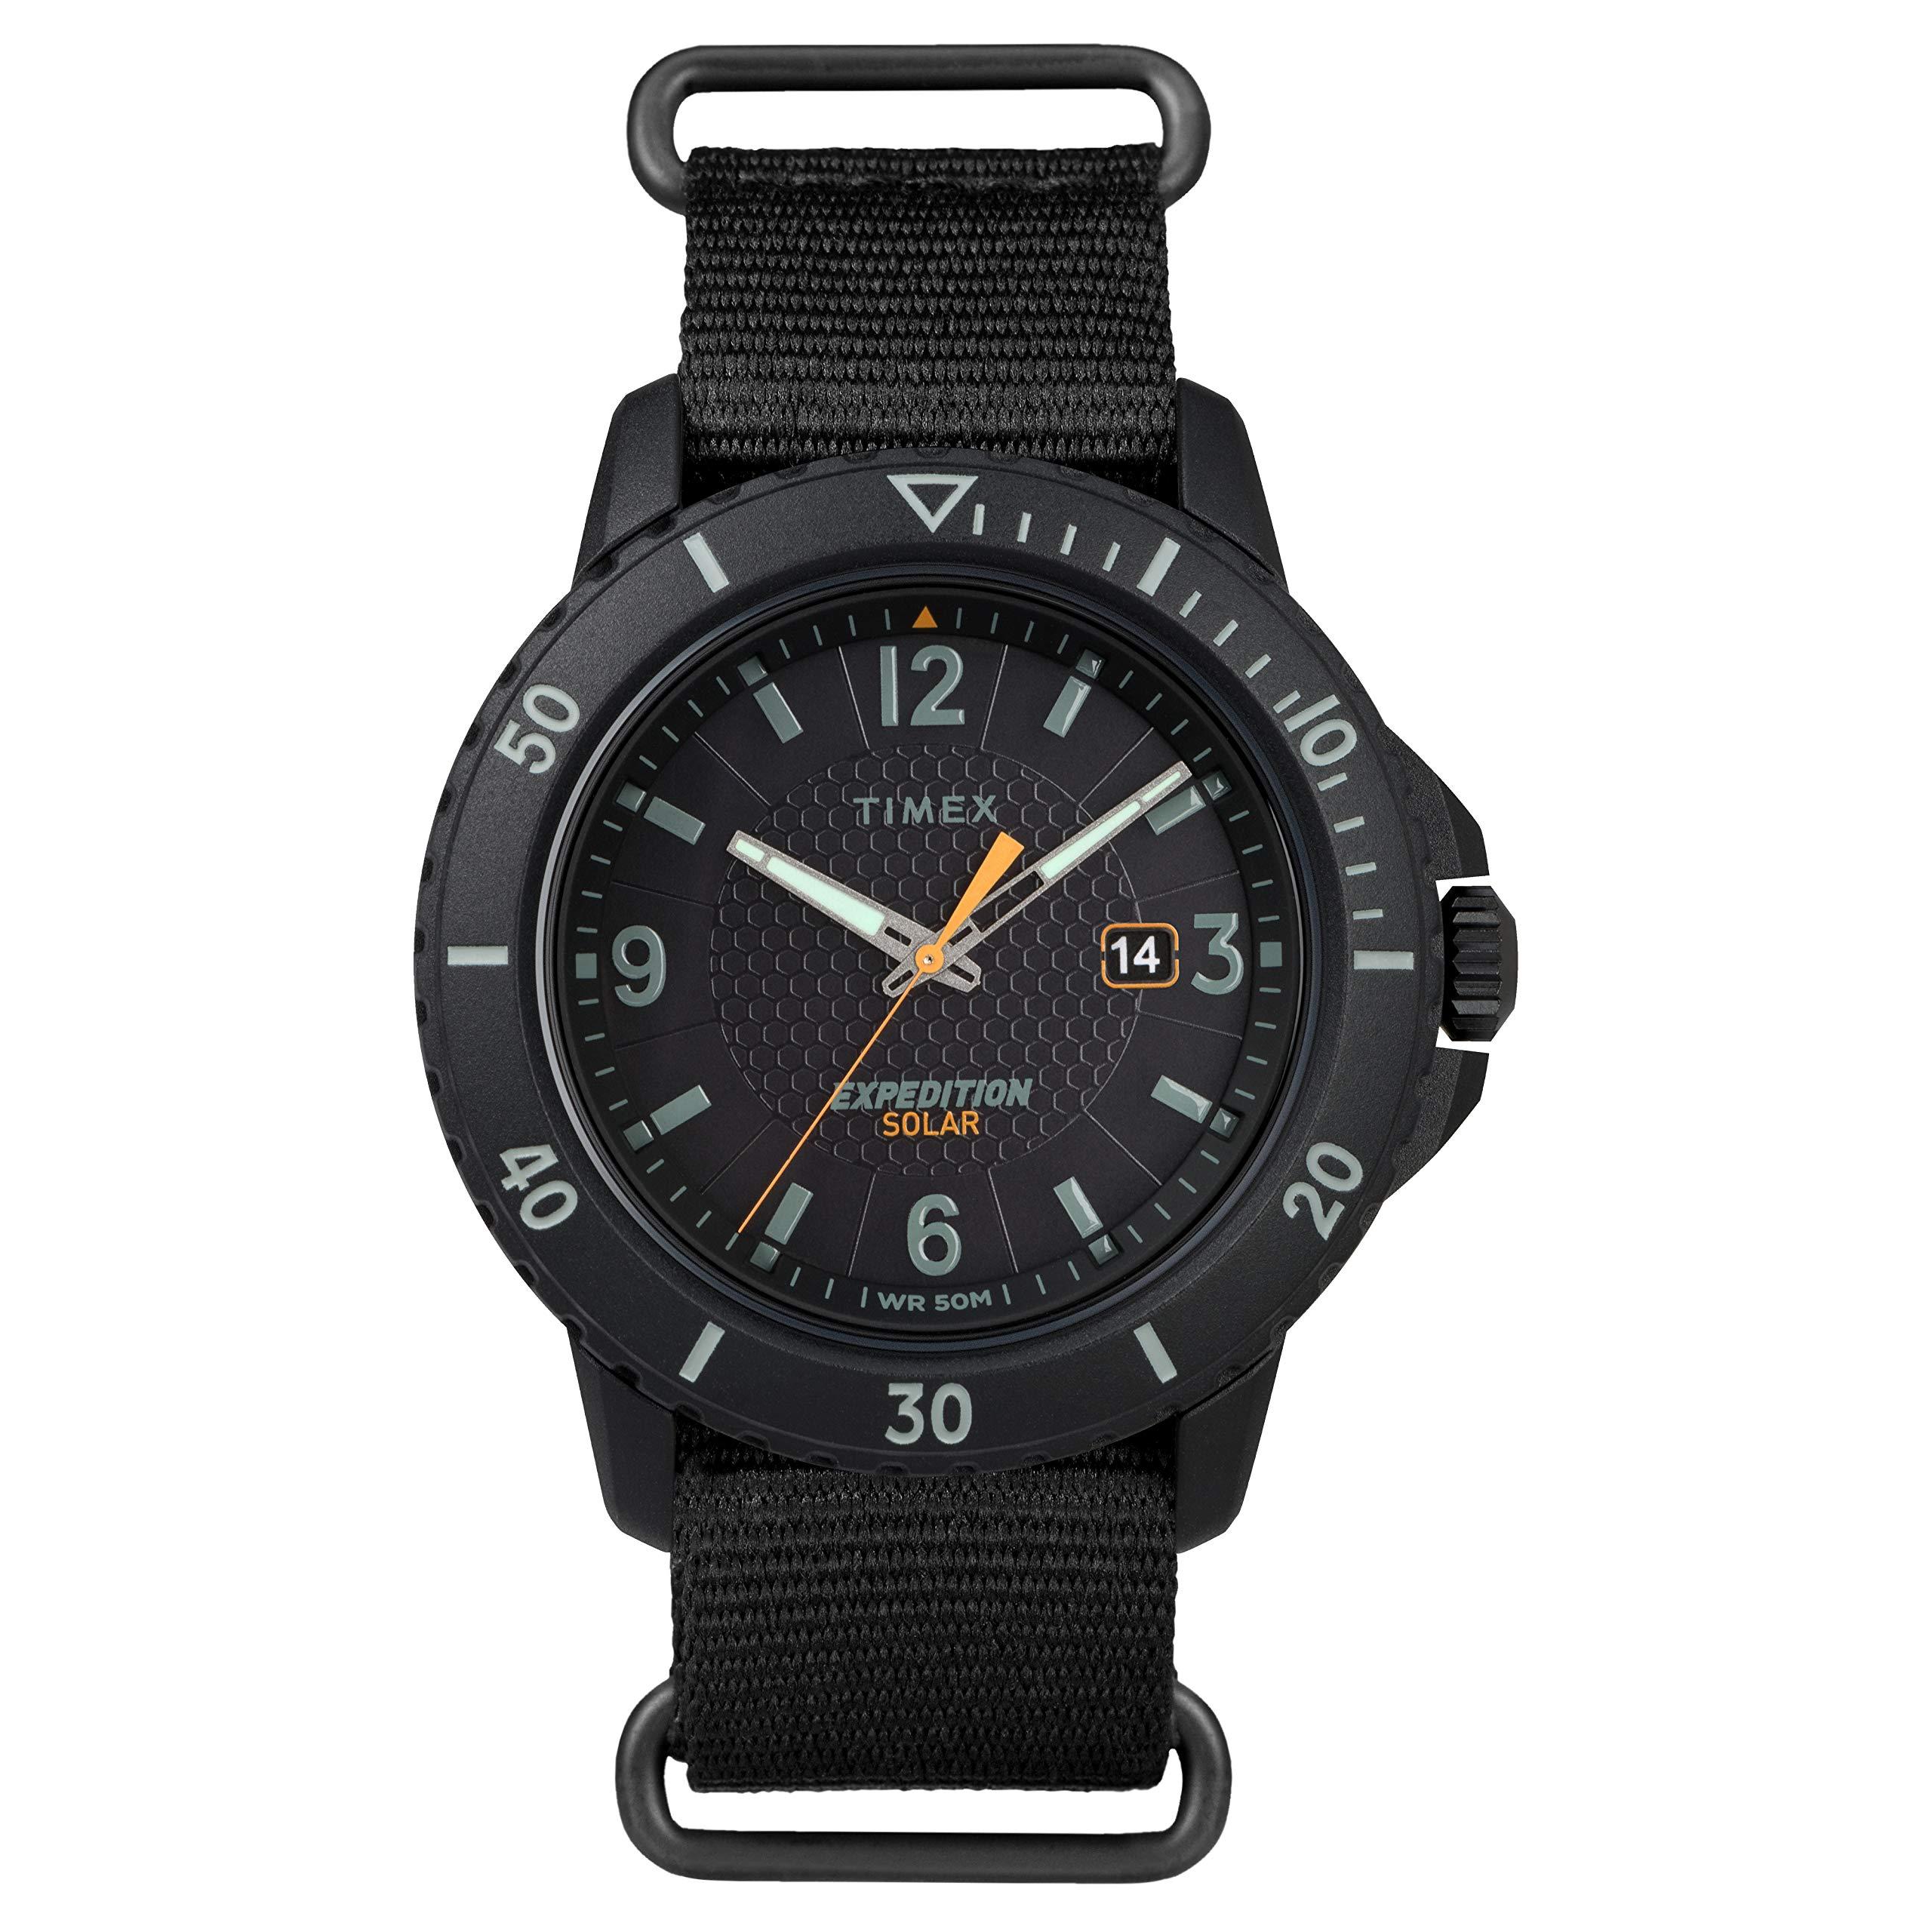 Men's Expedition Gallatin Solar-Powered Watch